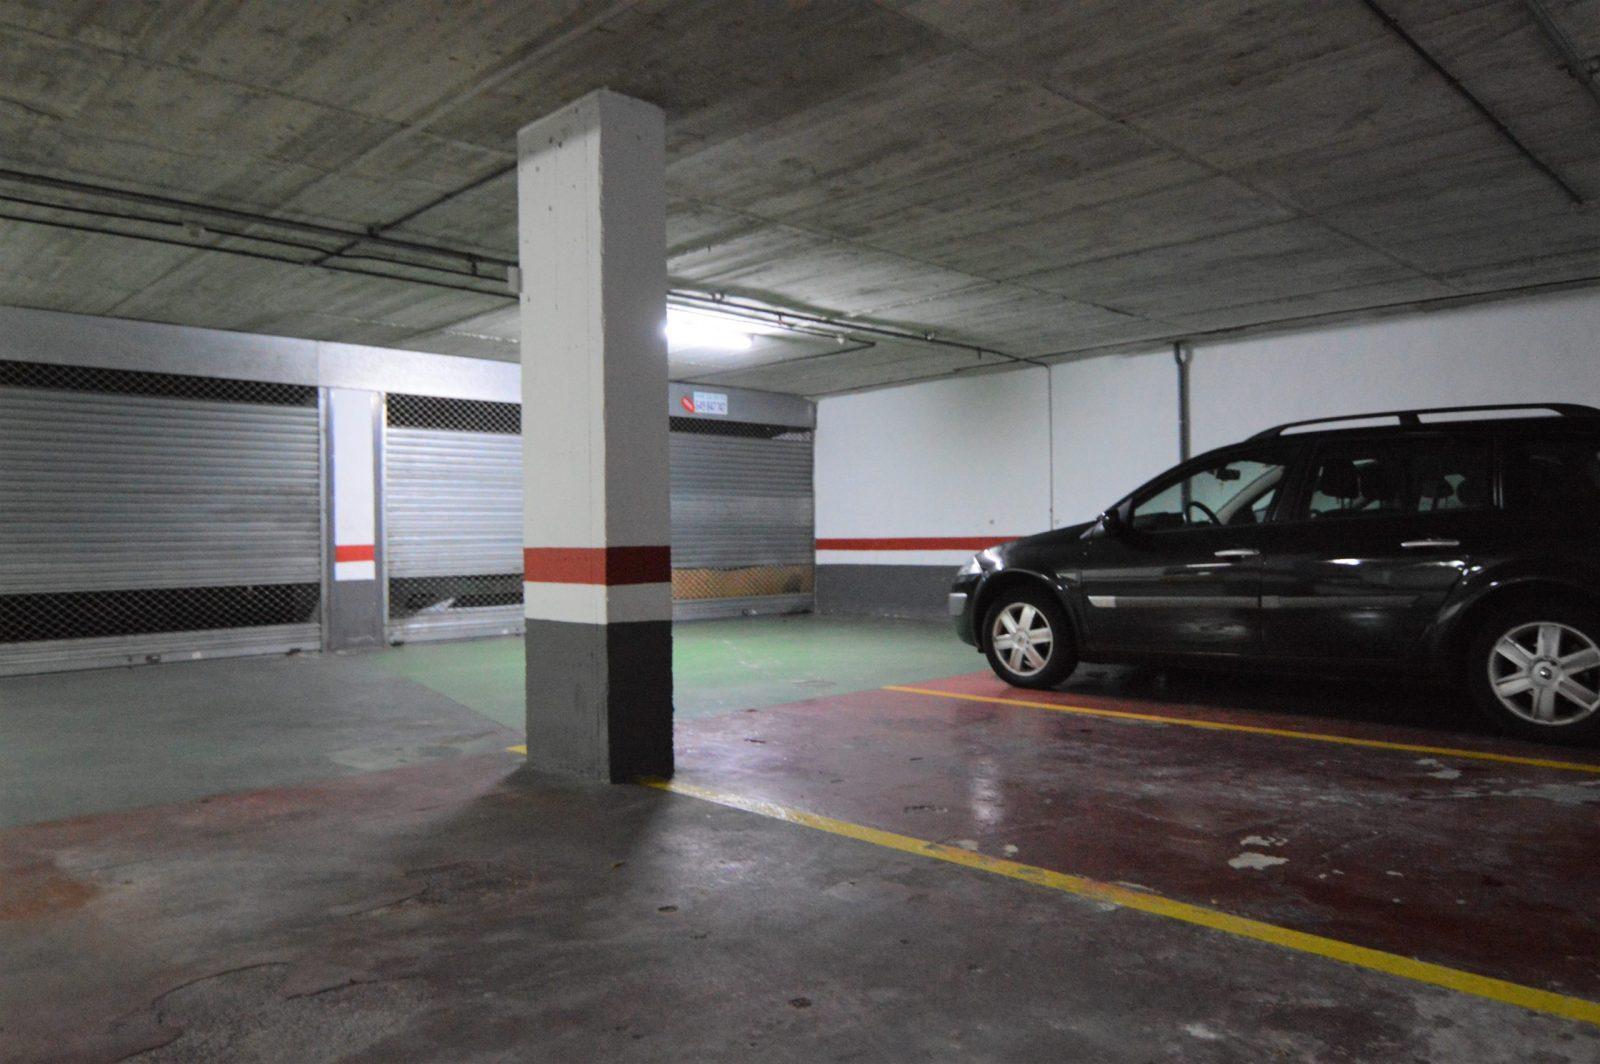 Plaza de garaje Calle Landazabal, 7, S2, 4